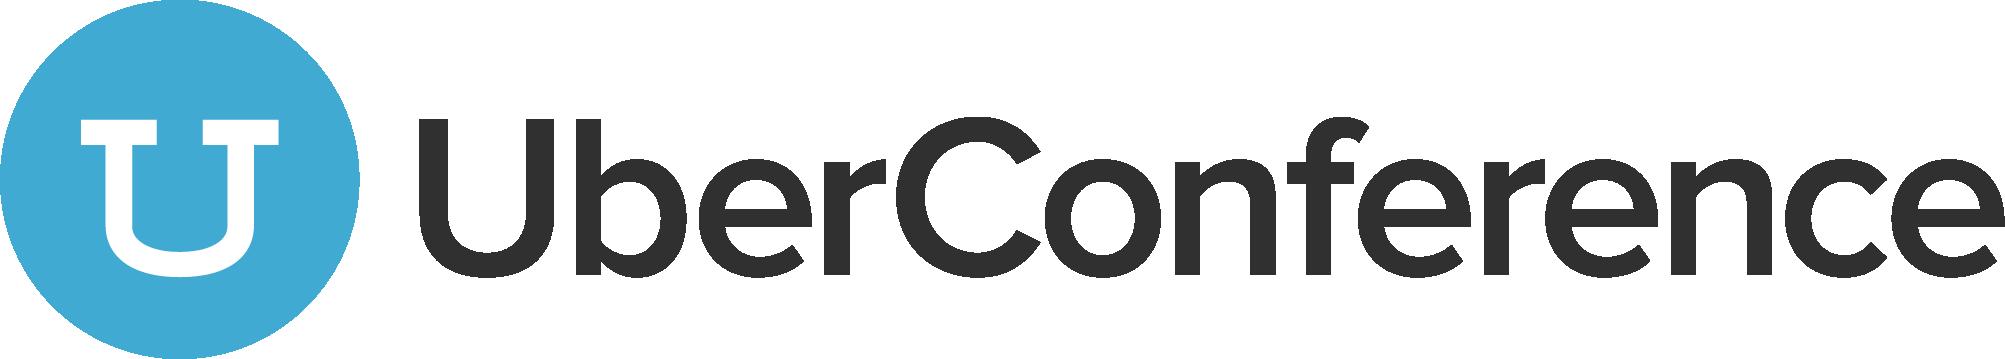 UberConference_Logo